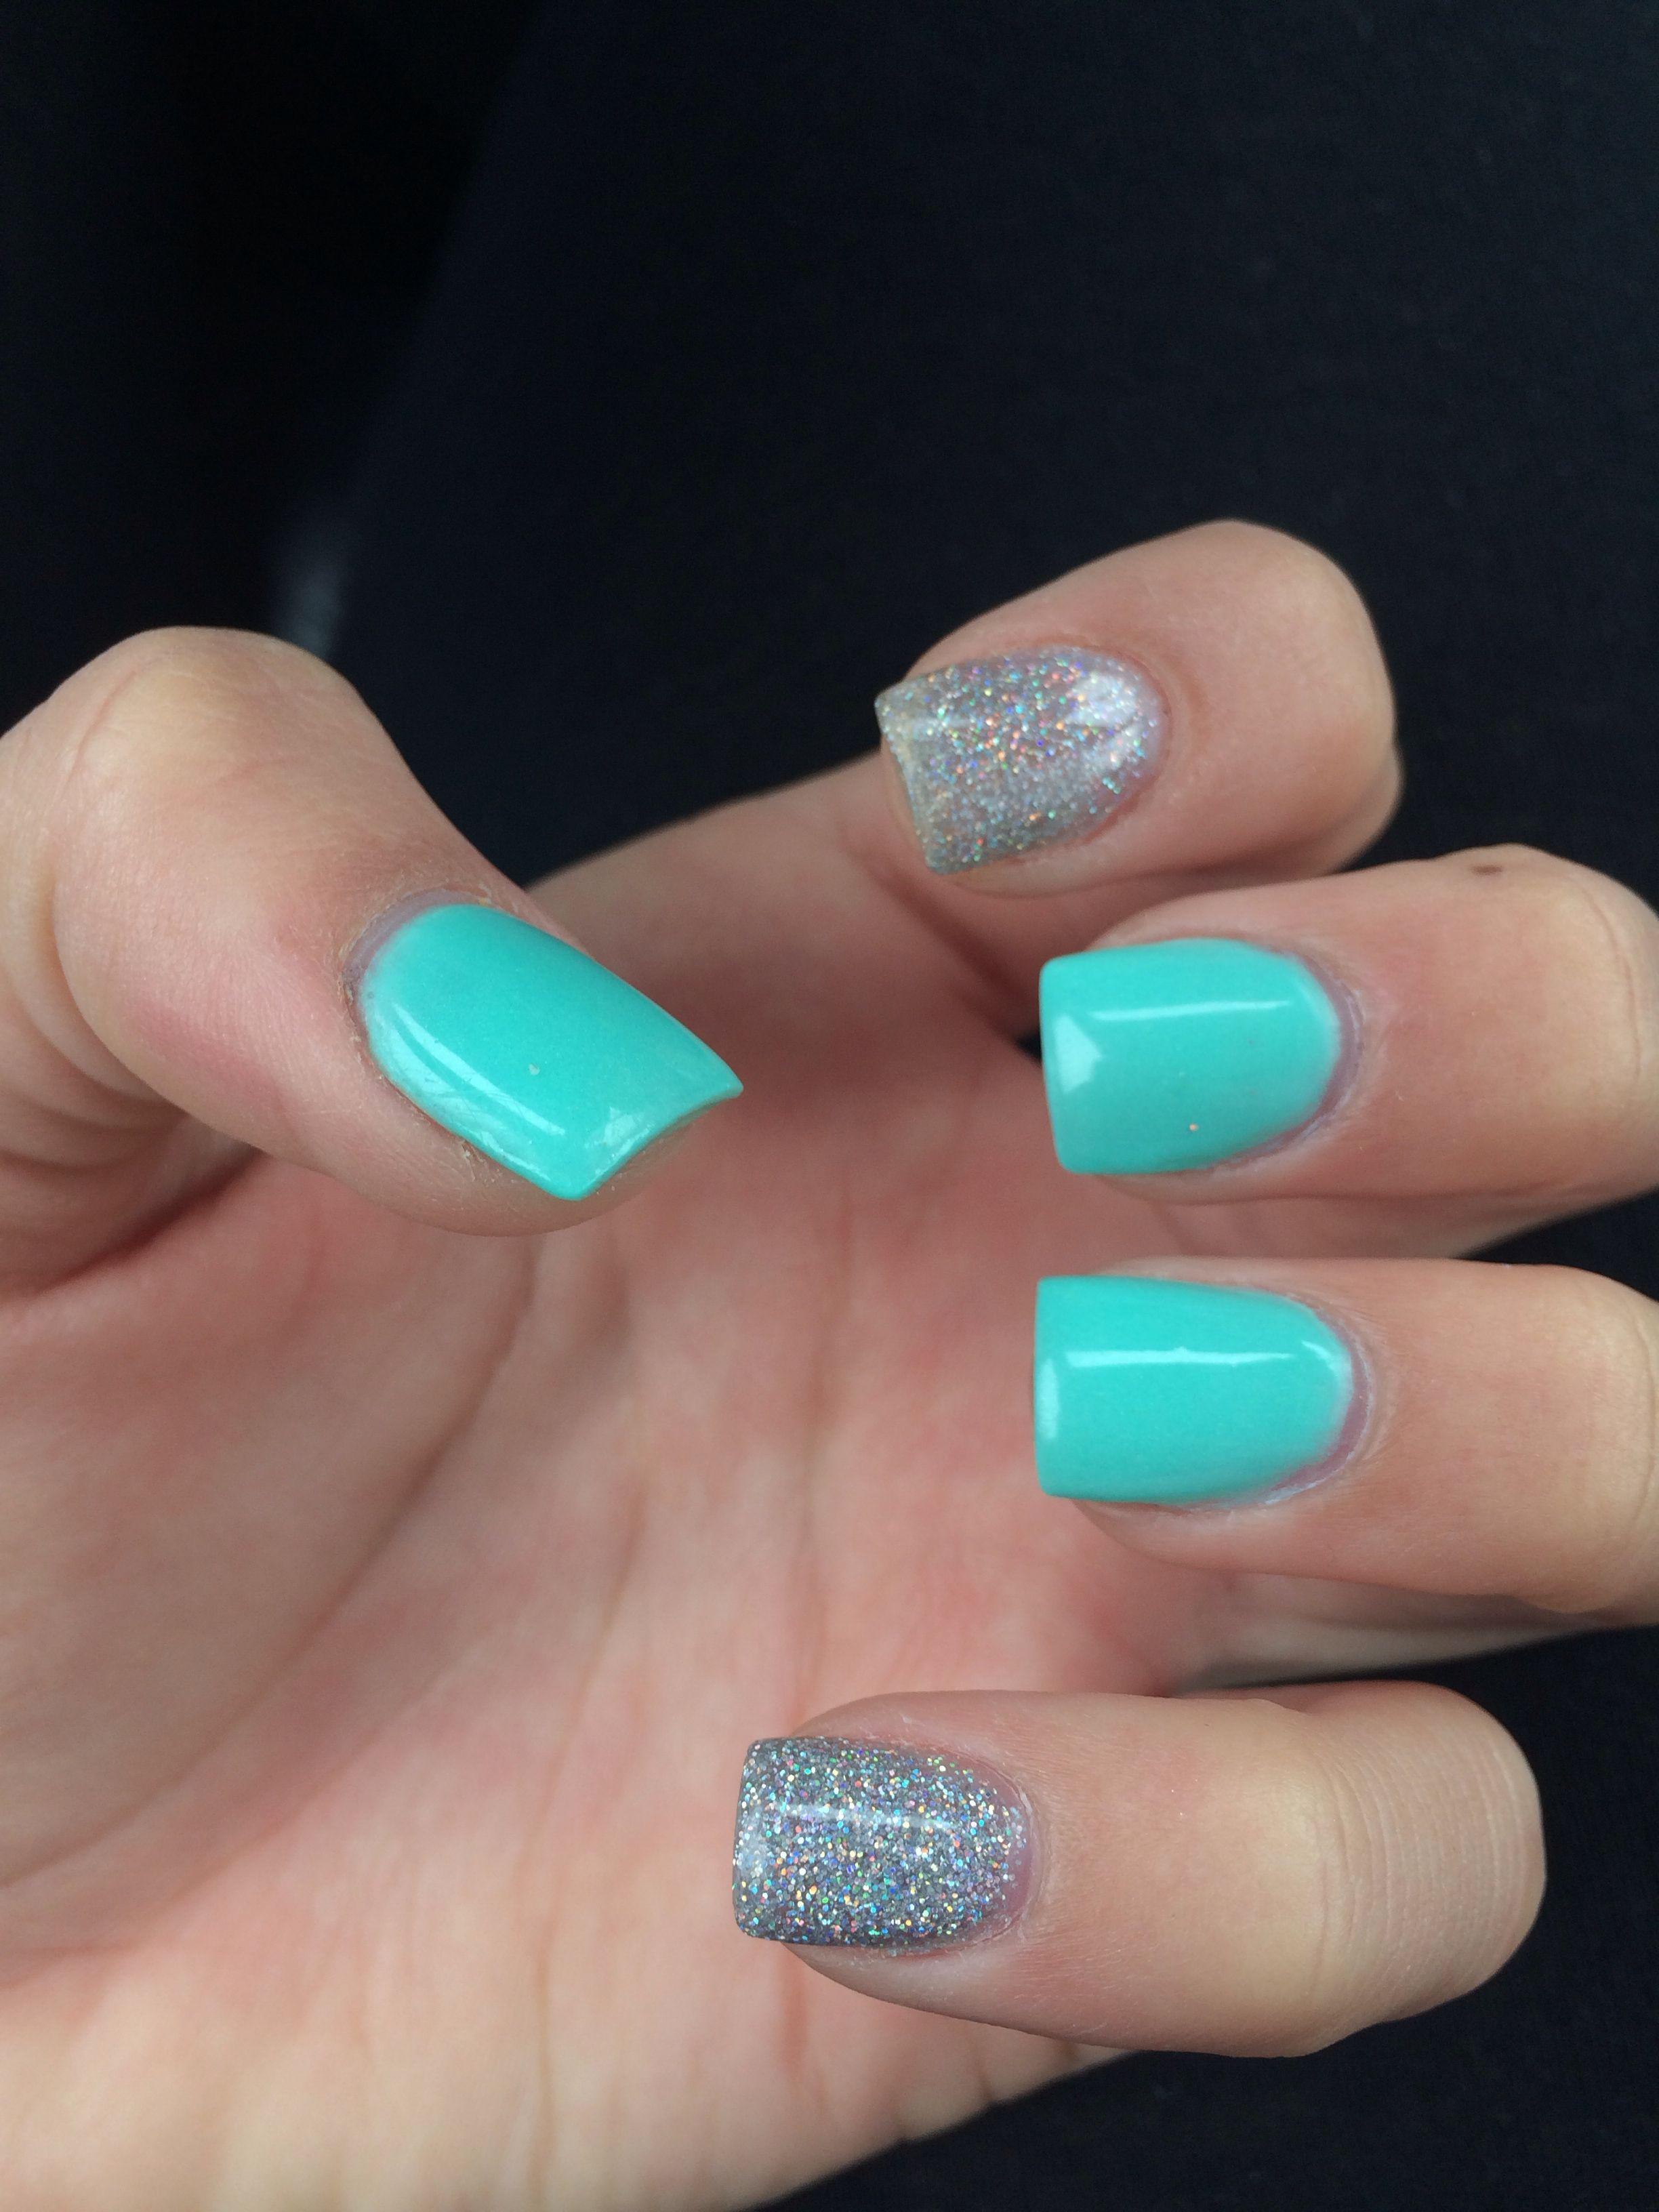 Teal acrylic nails | Nails((((: | Pinterest | Manicuras ...